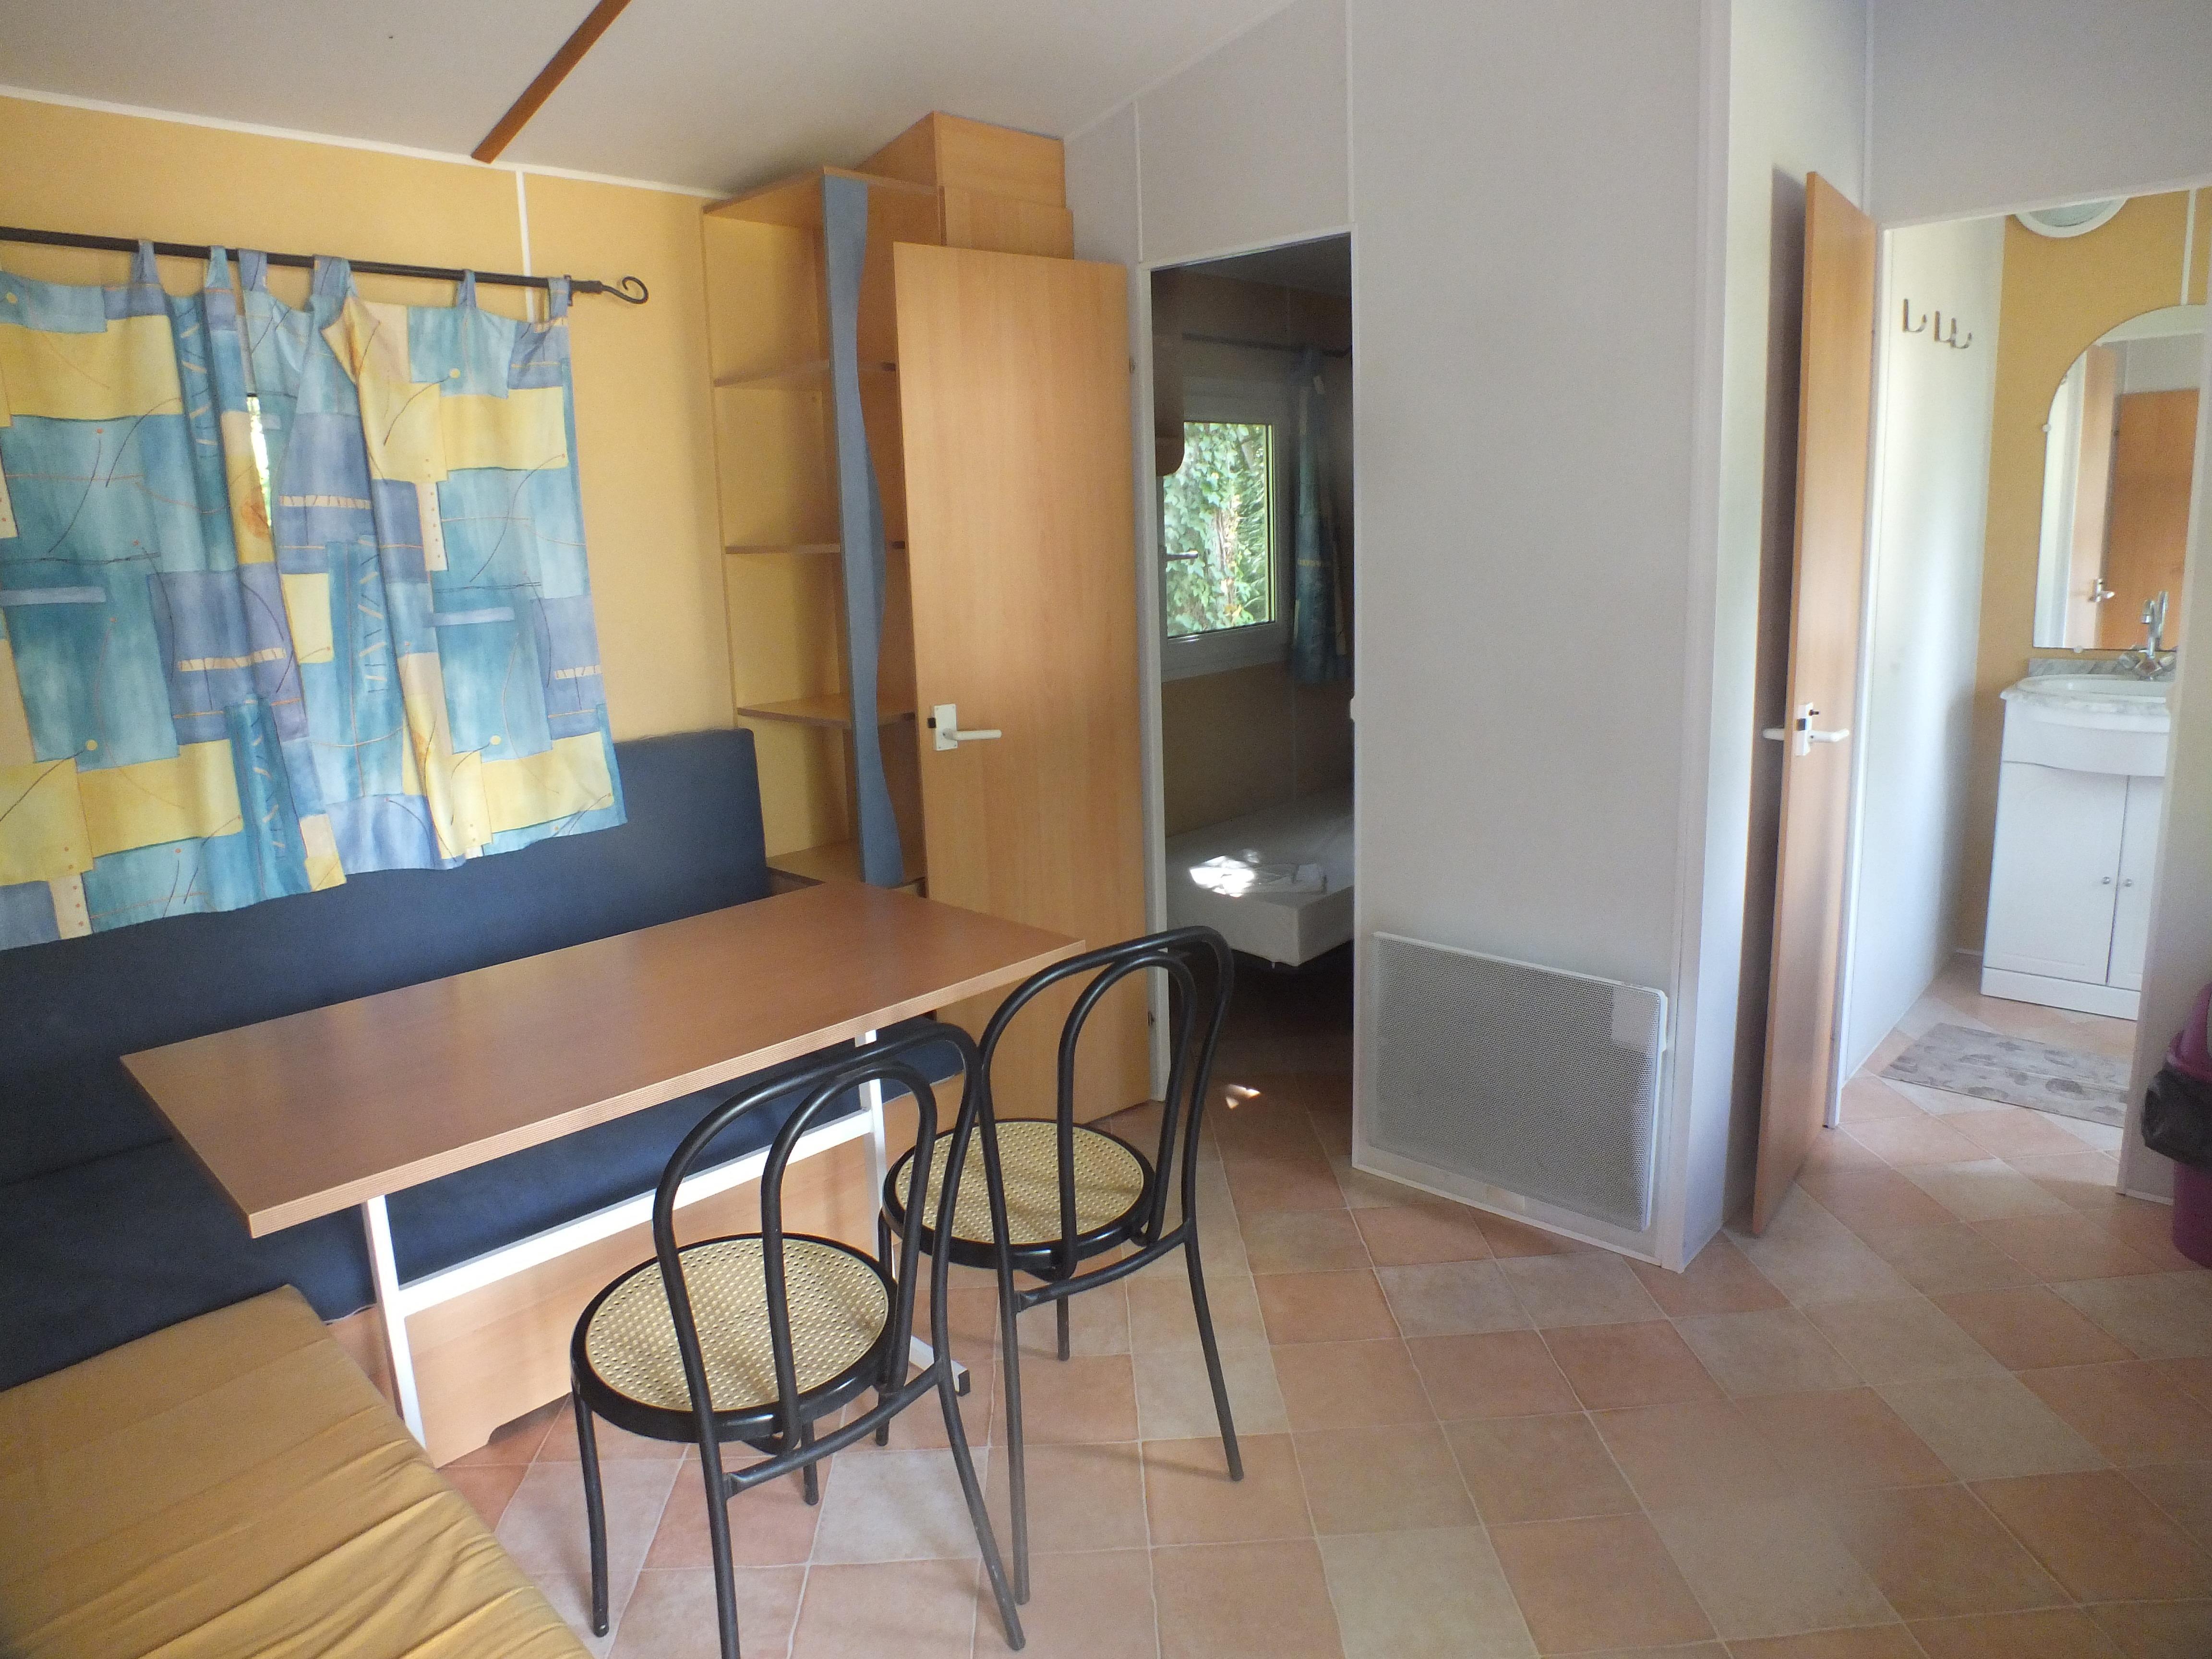 Mobil-home Watipi Niagara - 28m² - 2 chambres -